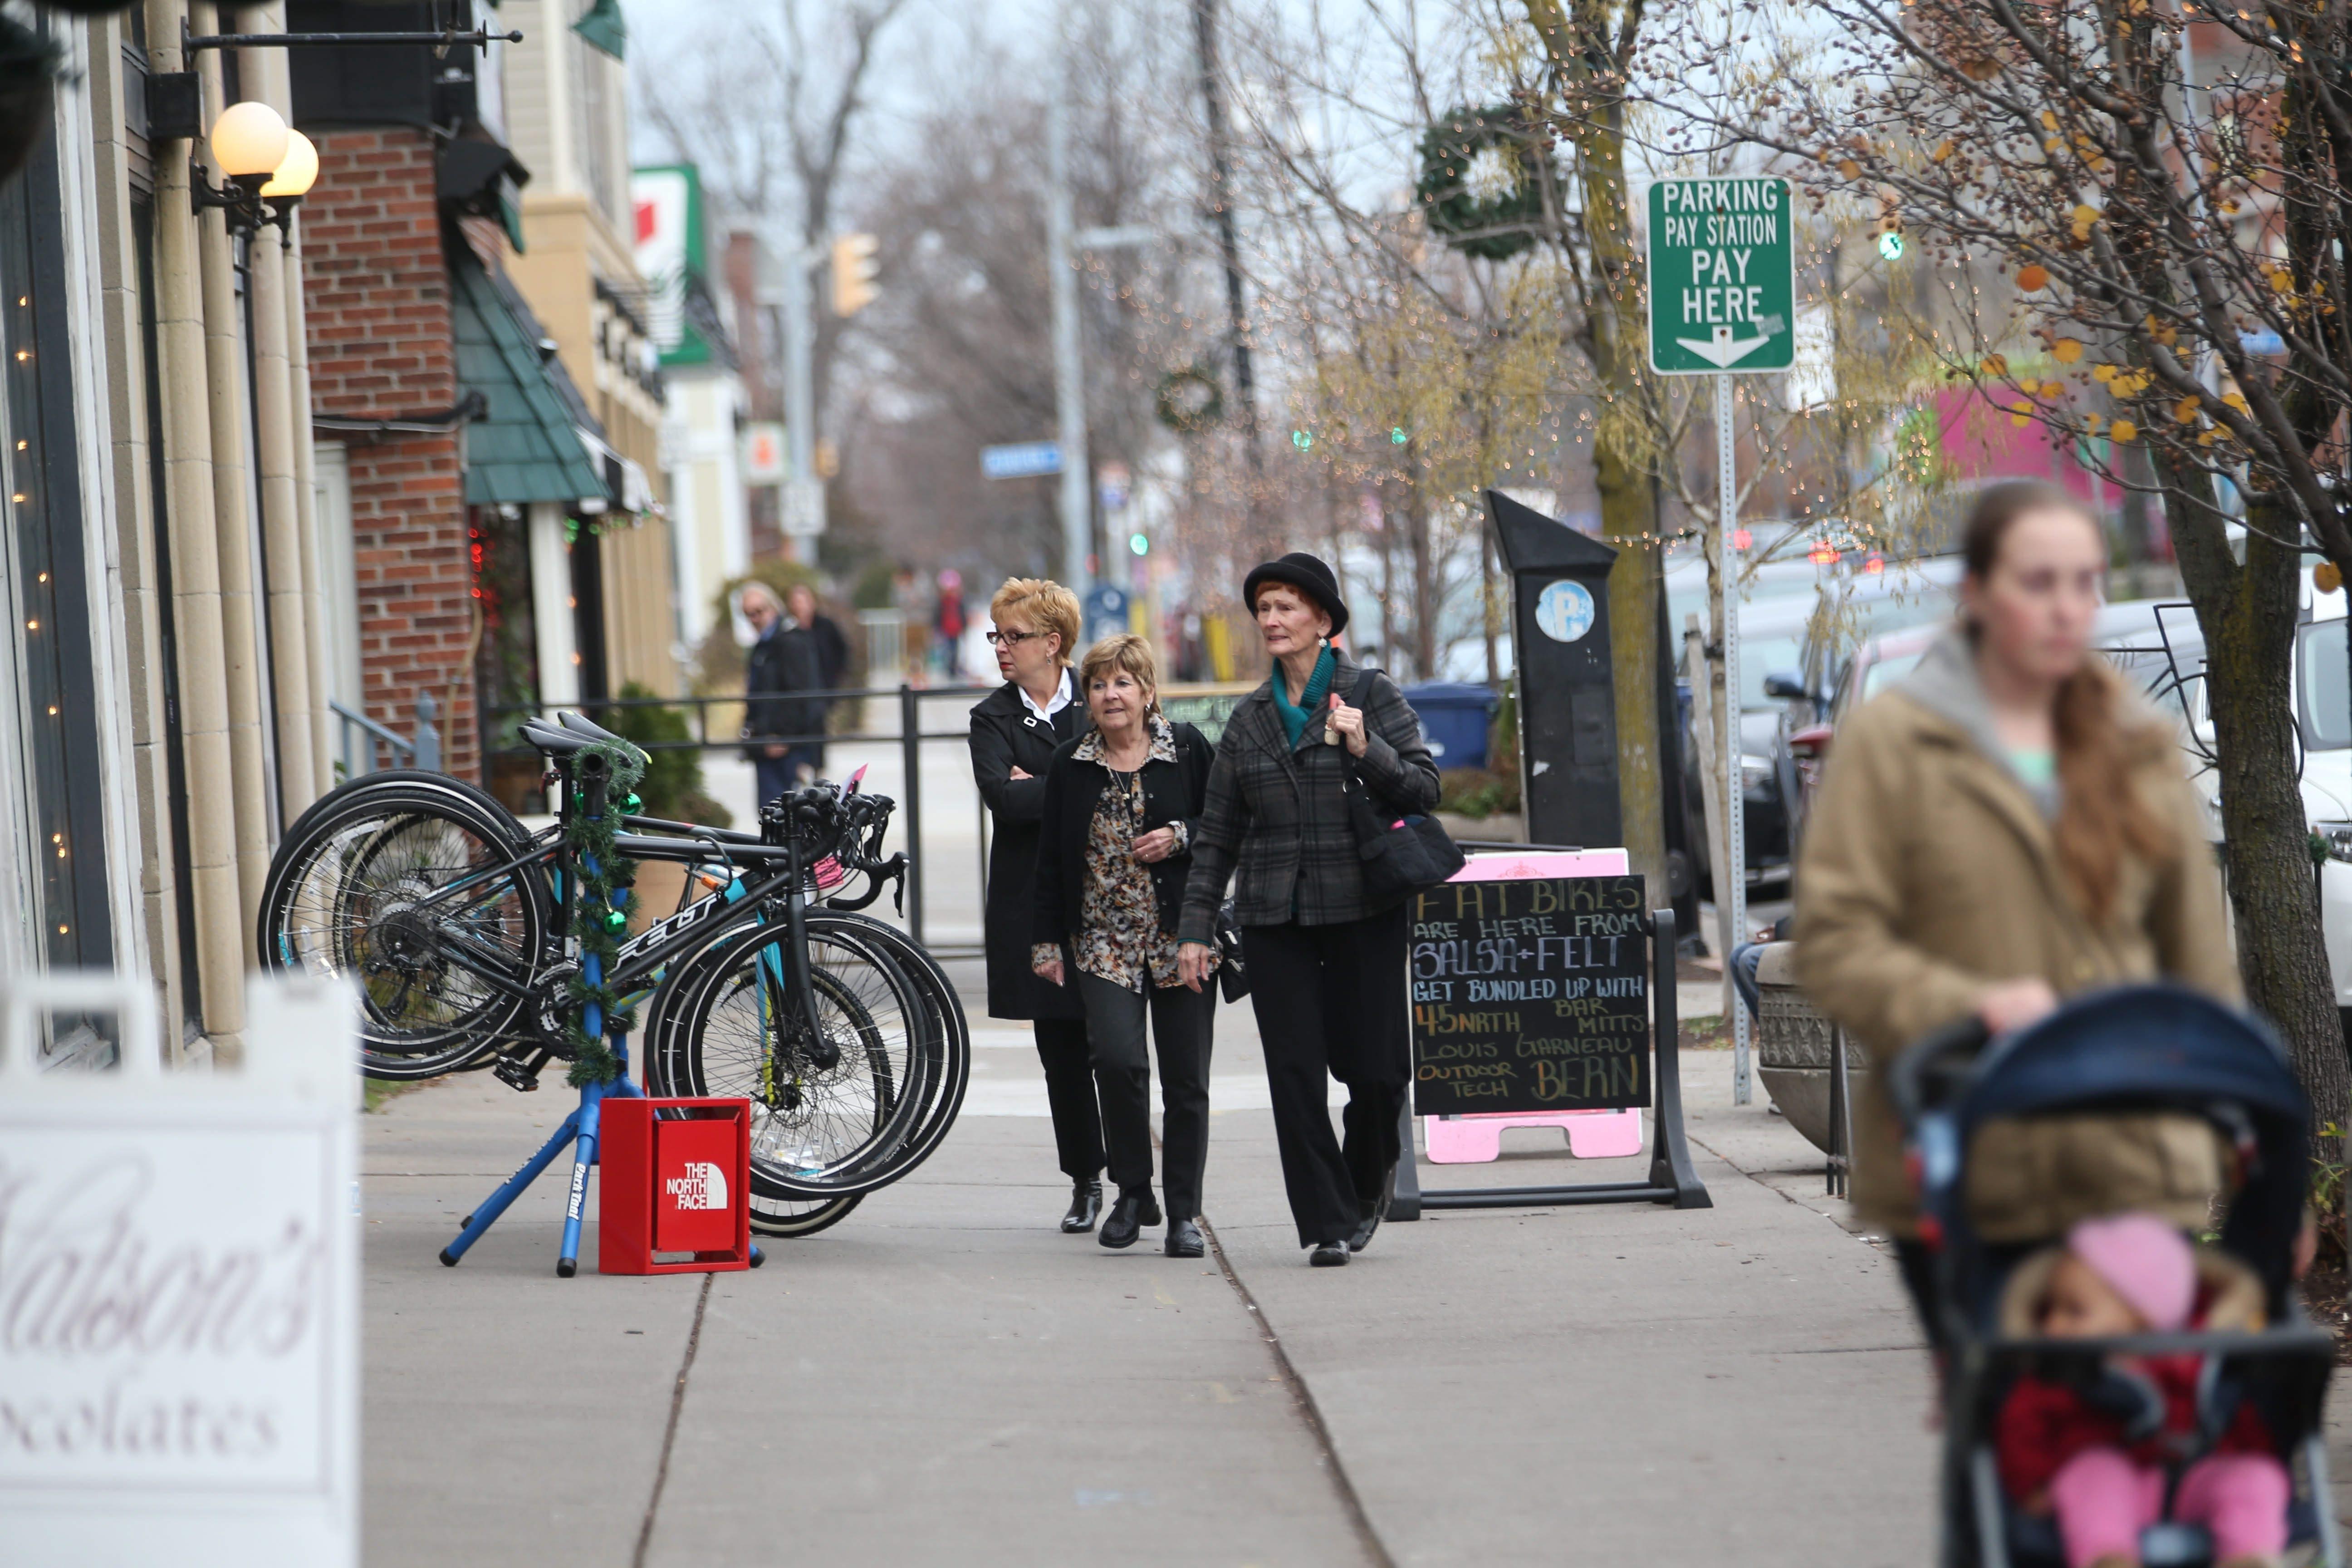 Christina Pokoj, left, of Orchard Park; Dale Nikitas, of Barker; and Jan Adair, of Lockport, walk toward Everything Elmwood on Dec. 10. (Sharon Cantillon/Buffalo News)